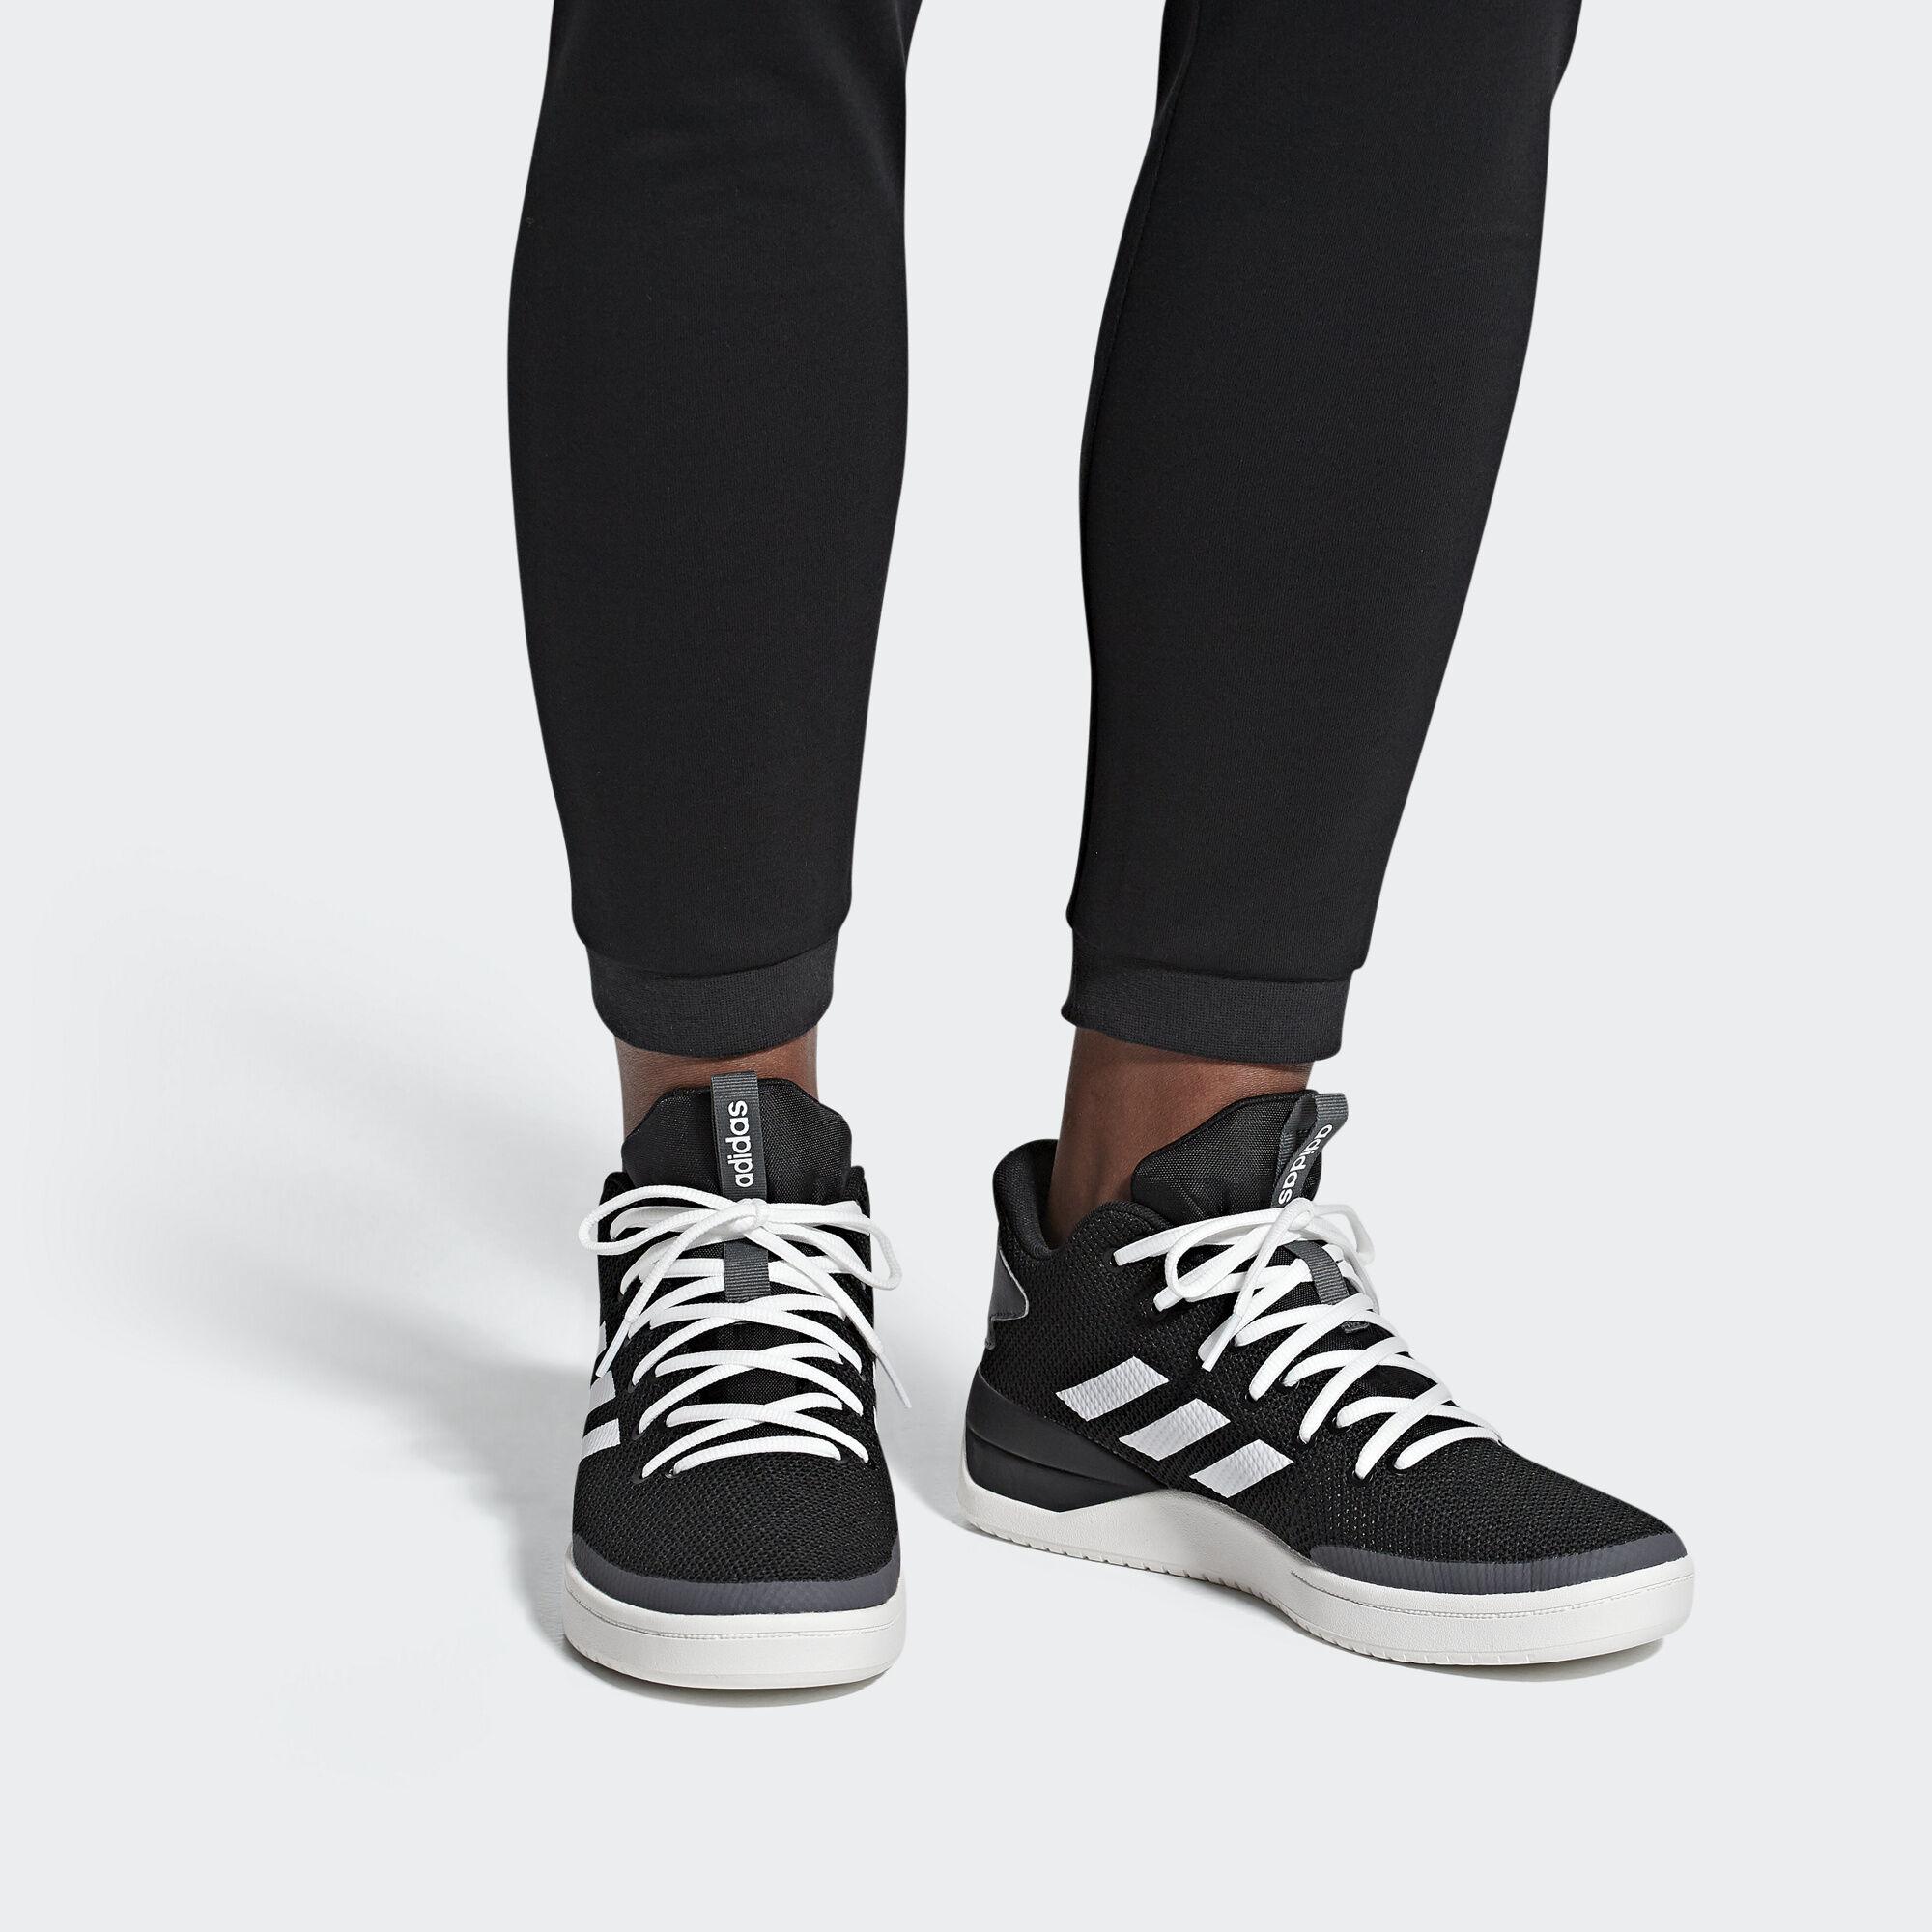 wholesale dealer 8f13a 2b86e adidas B-Ball 80s sko - Sort  adidas Denmark